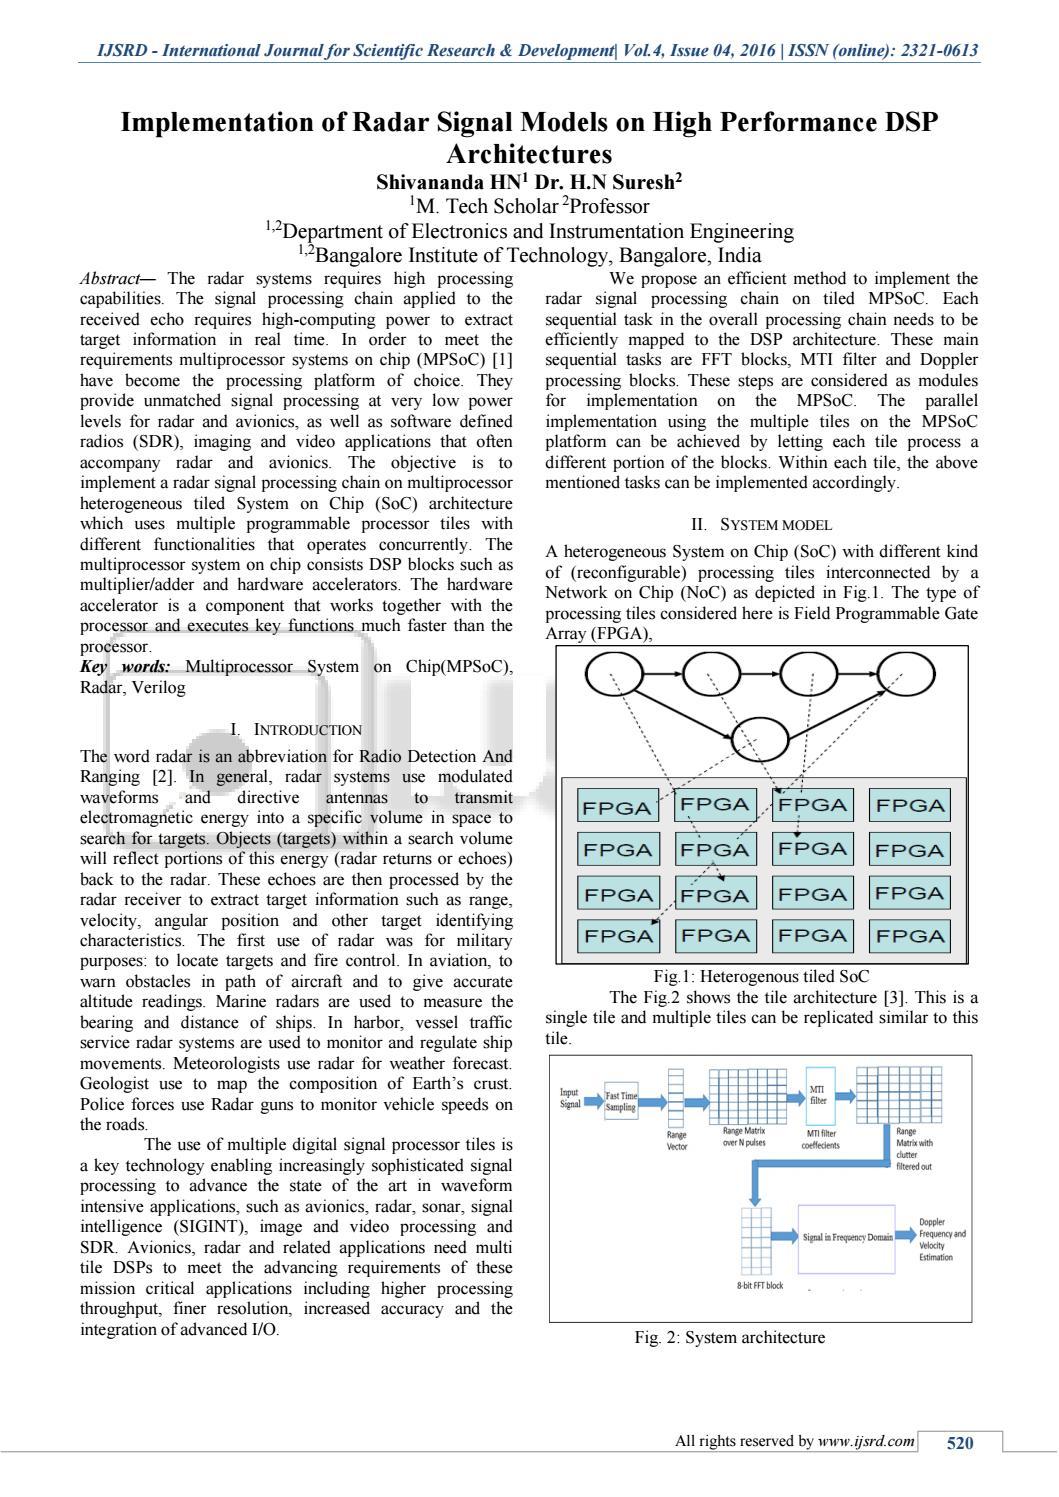 Implementation of Radar Signal Processing Model on Tiled System on